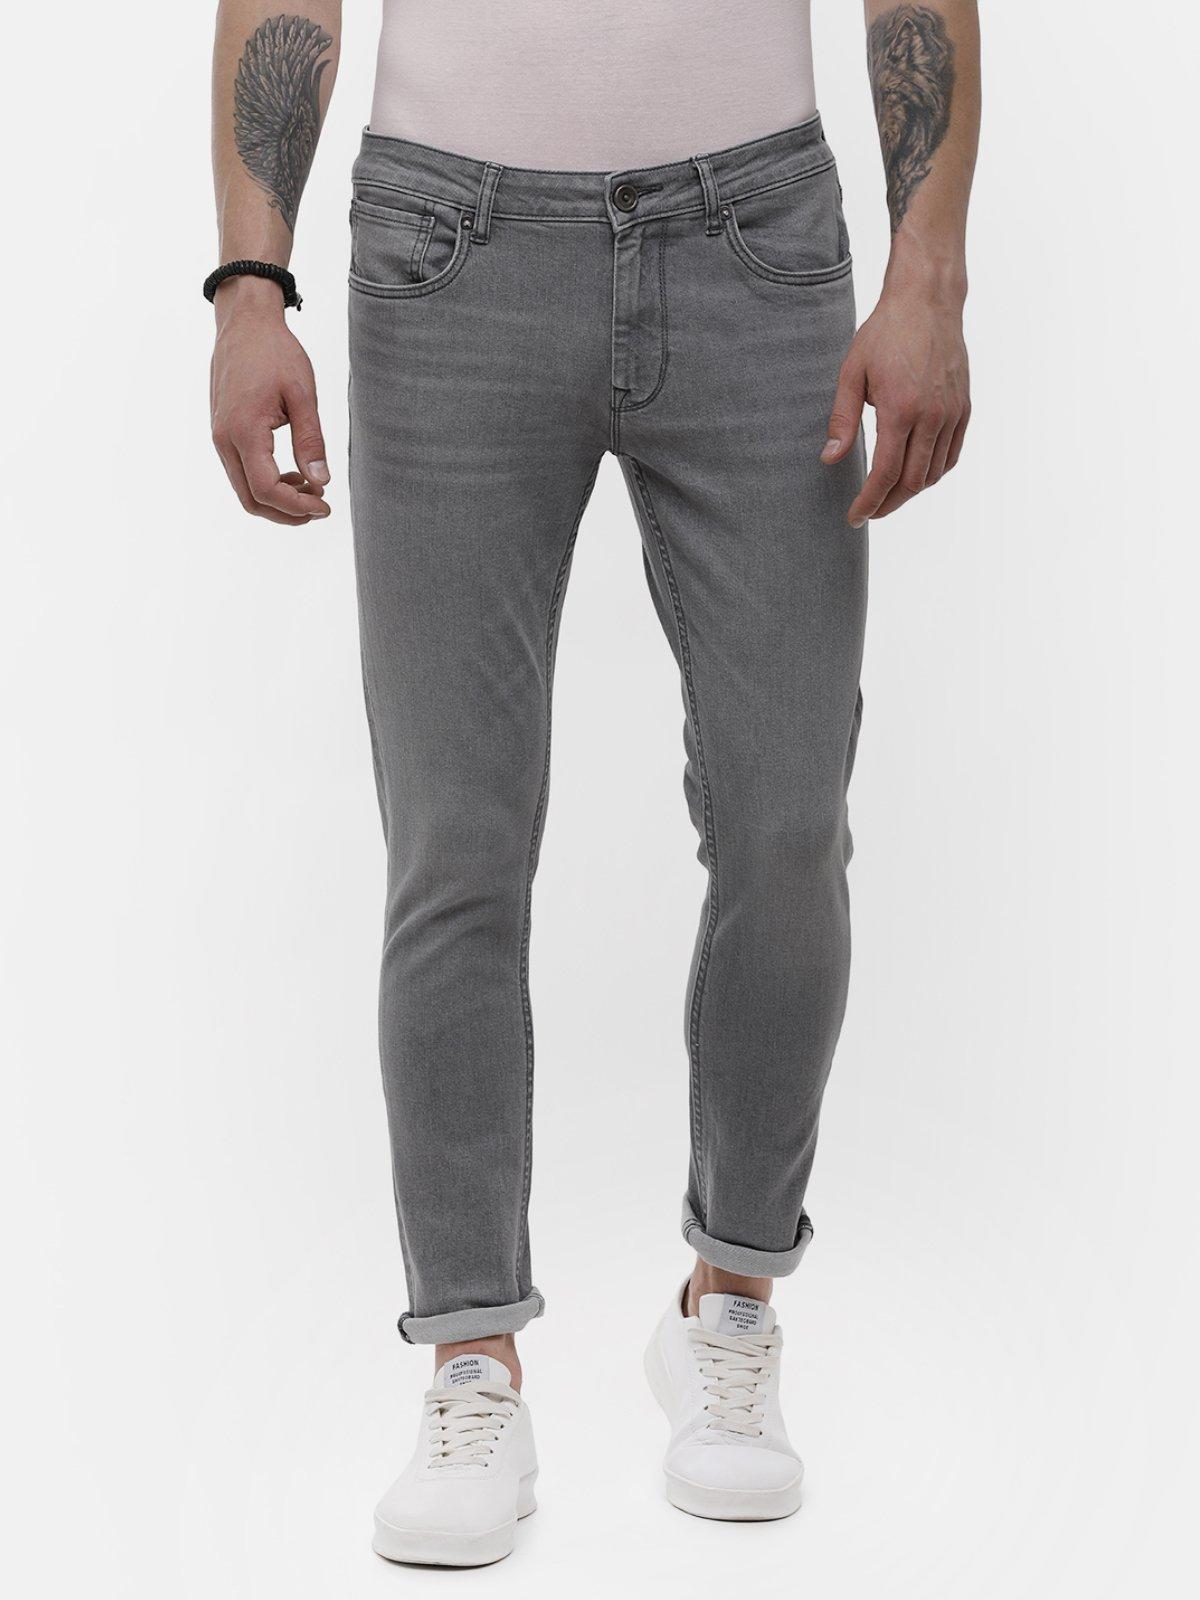 Voi Jeans | Gray Jeans (VOJN1510)